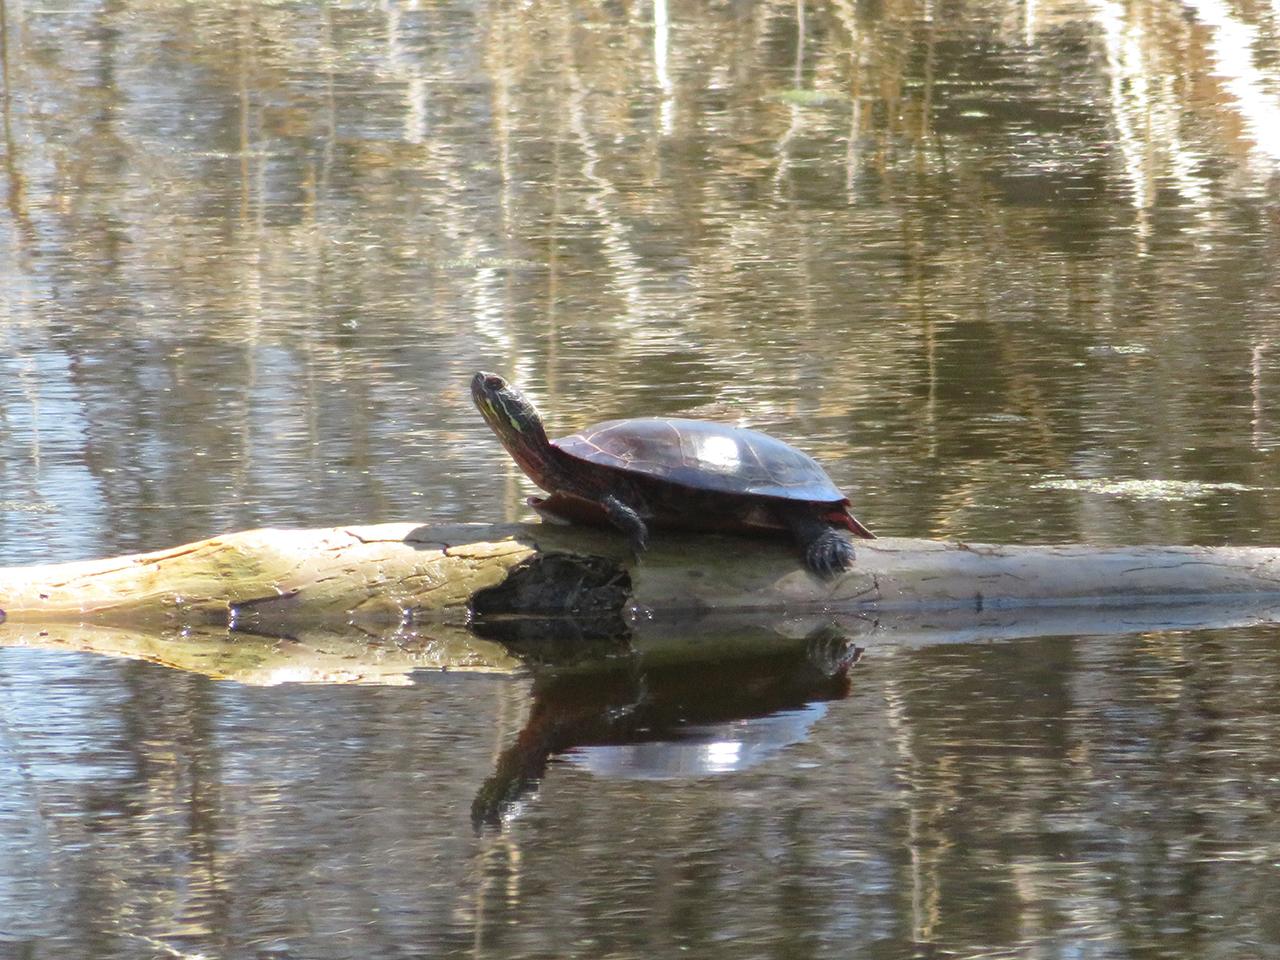 Turtle enjoying the sun in Seneca County (photo)